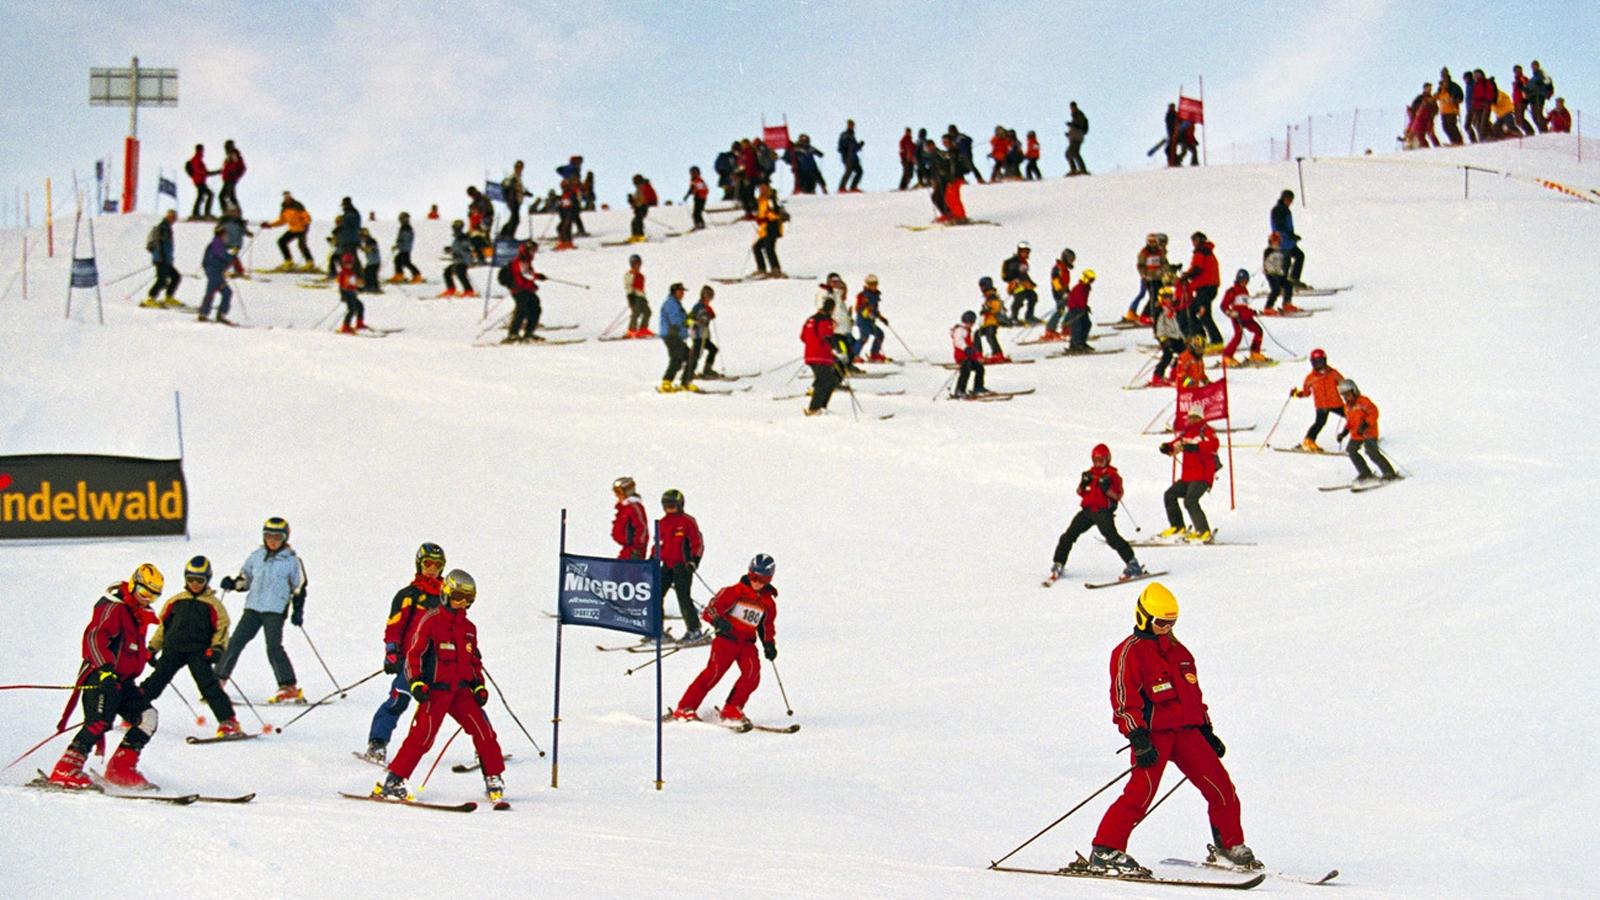 Ski alpin: Probleme in den Regionen